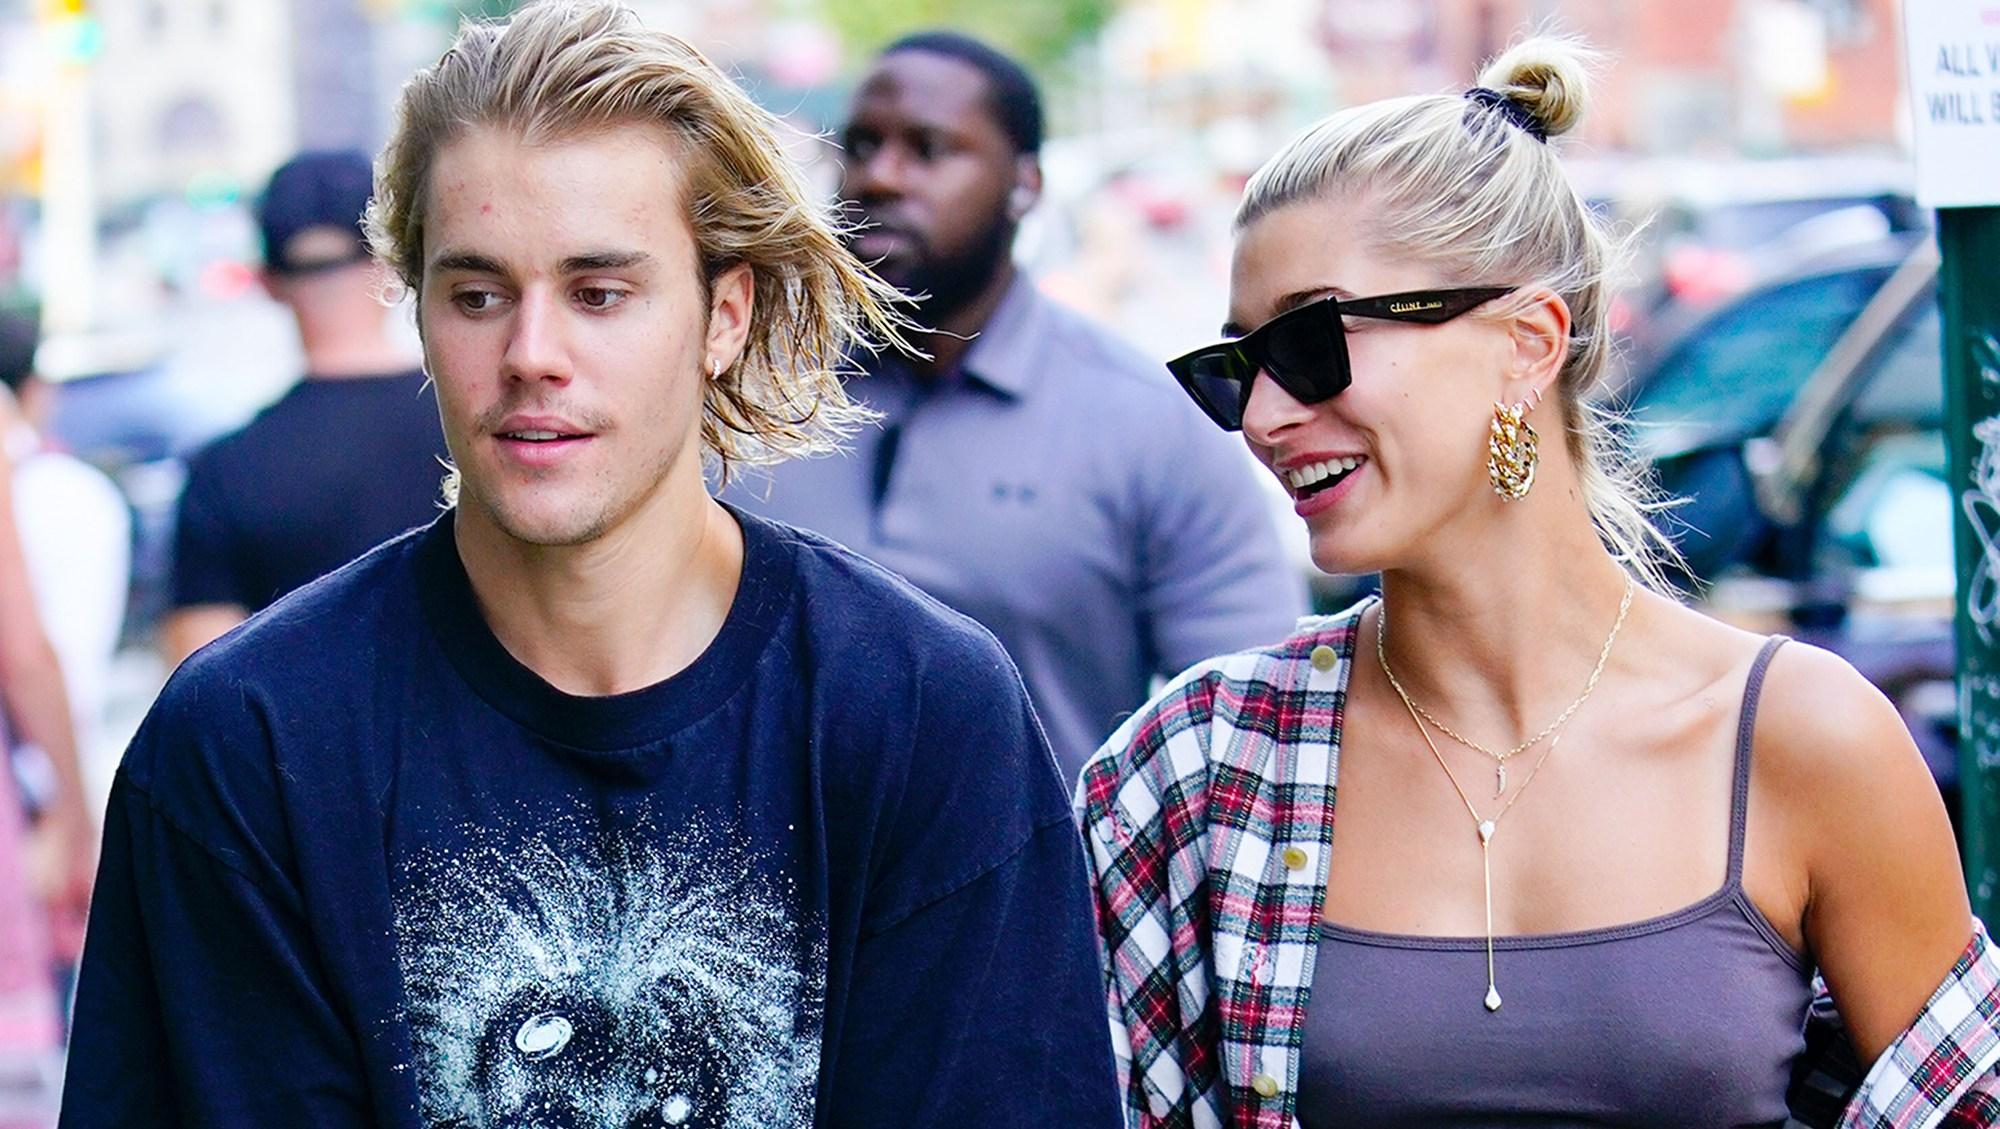 Hailey Baldwin and Justin Bieber married